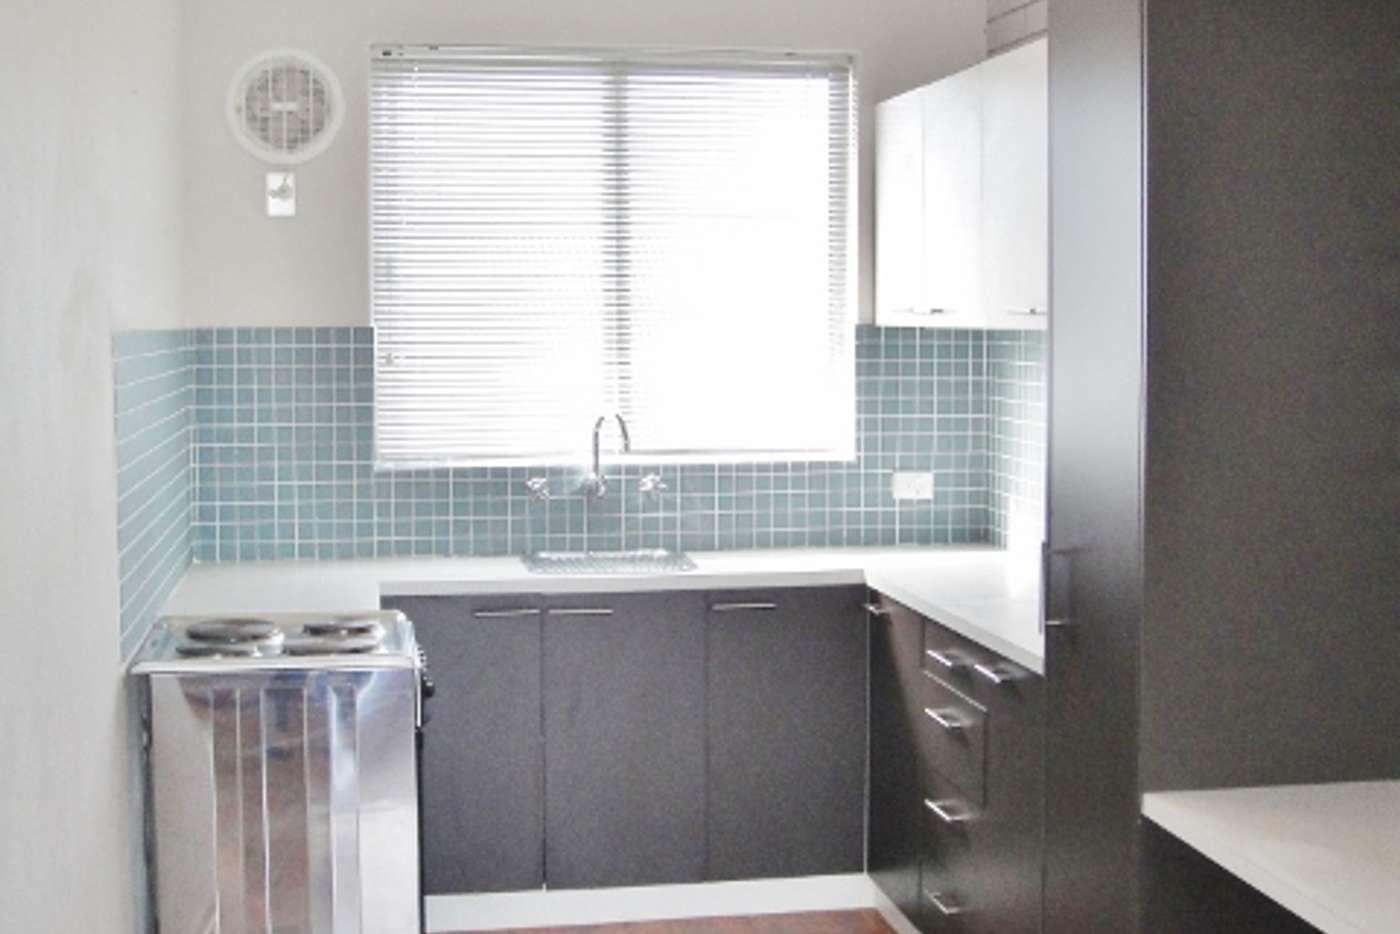 Main view of Homely unit listing, 8/12 Banksia Street, Joondanna WA 6060